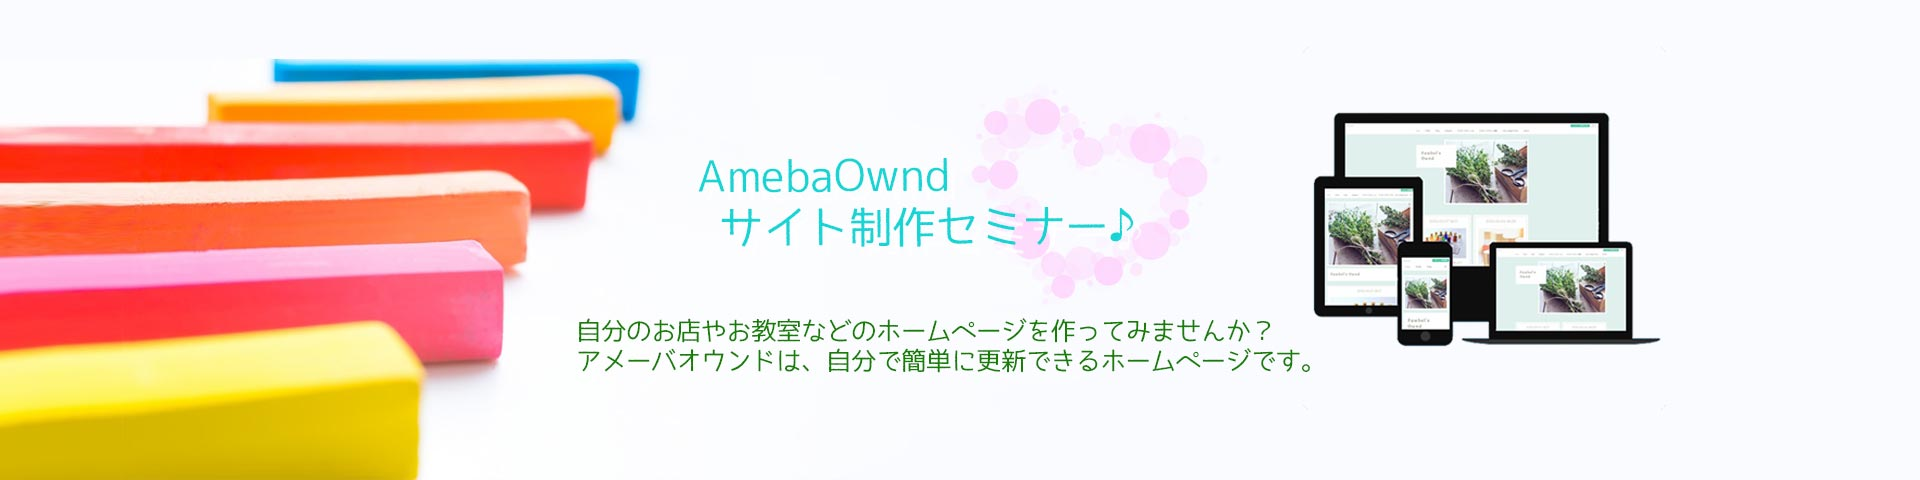 AmebaOwndで作るサイト制作セミナー